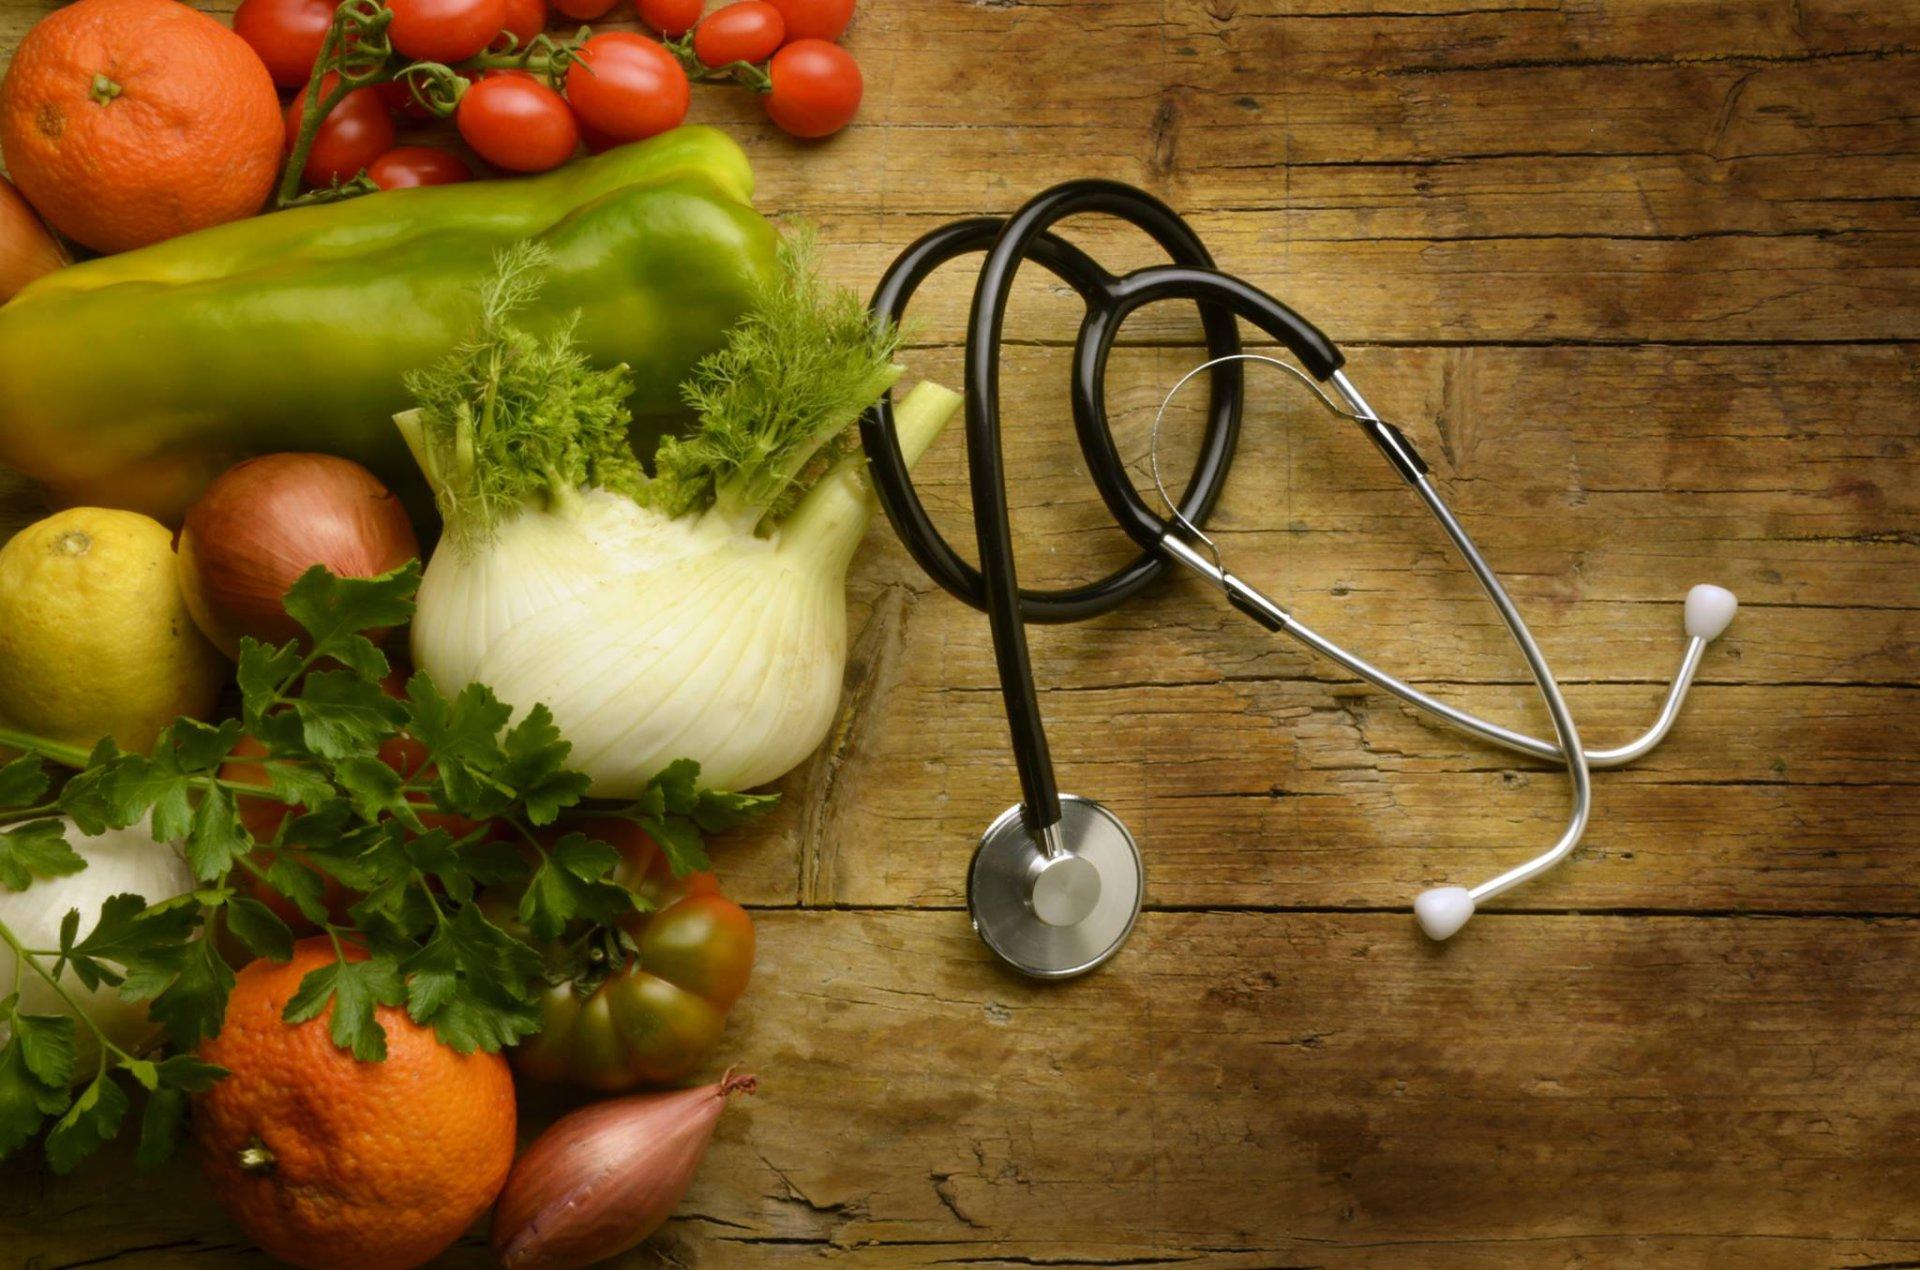 ar galima valgyti vištieną su hipertenzija